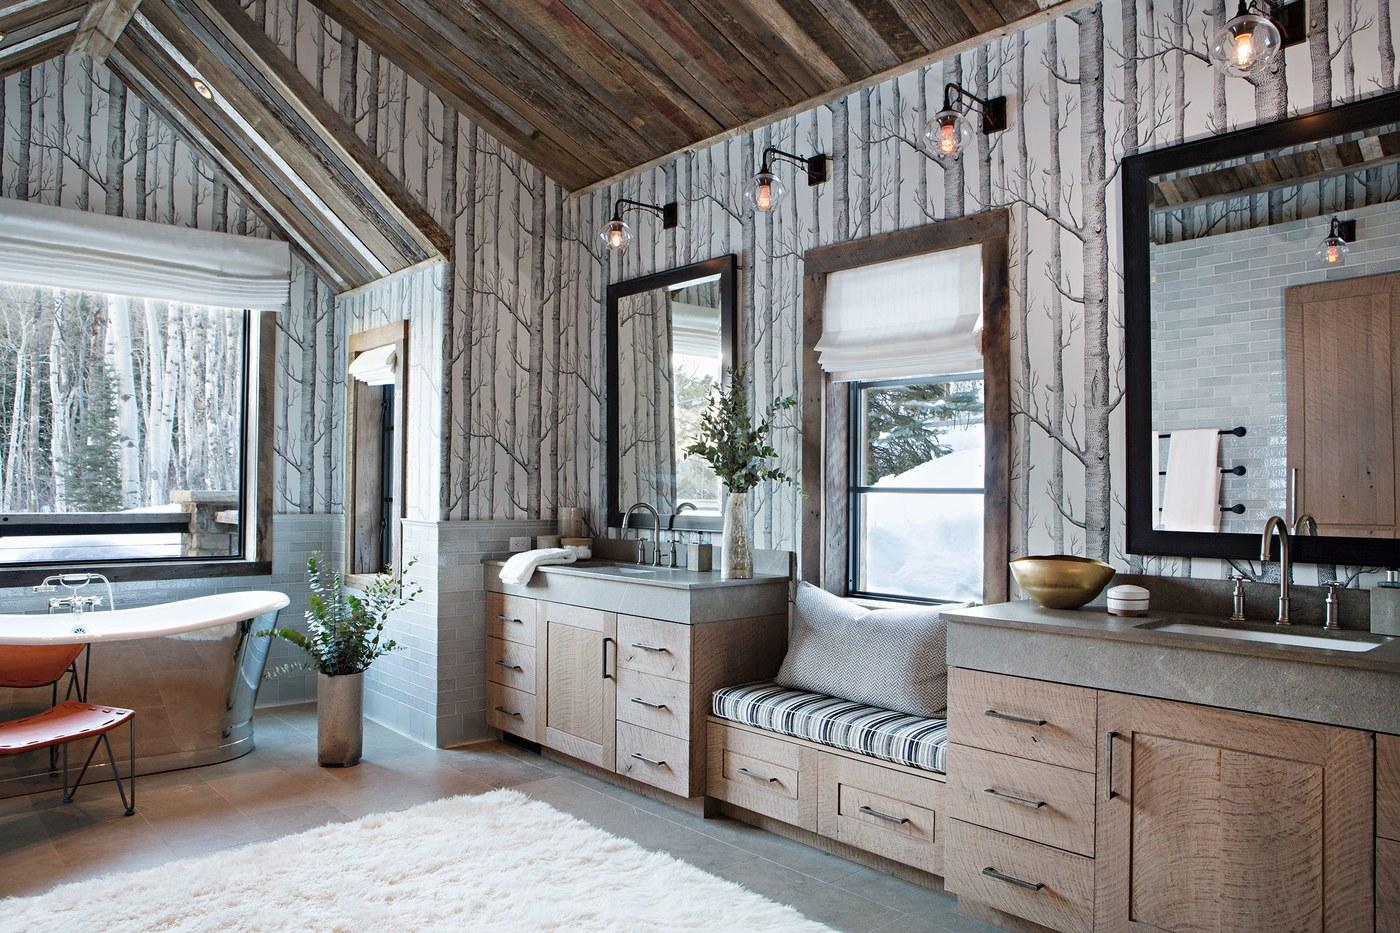 Rustic Design Ideas Log Homes Farmhouse Rustic Home Decor,Small Bathroom Designs Floor Plans